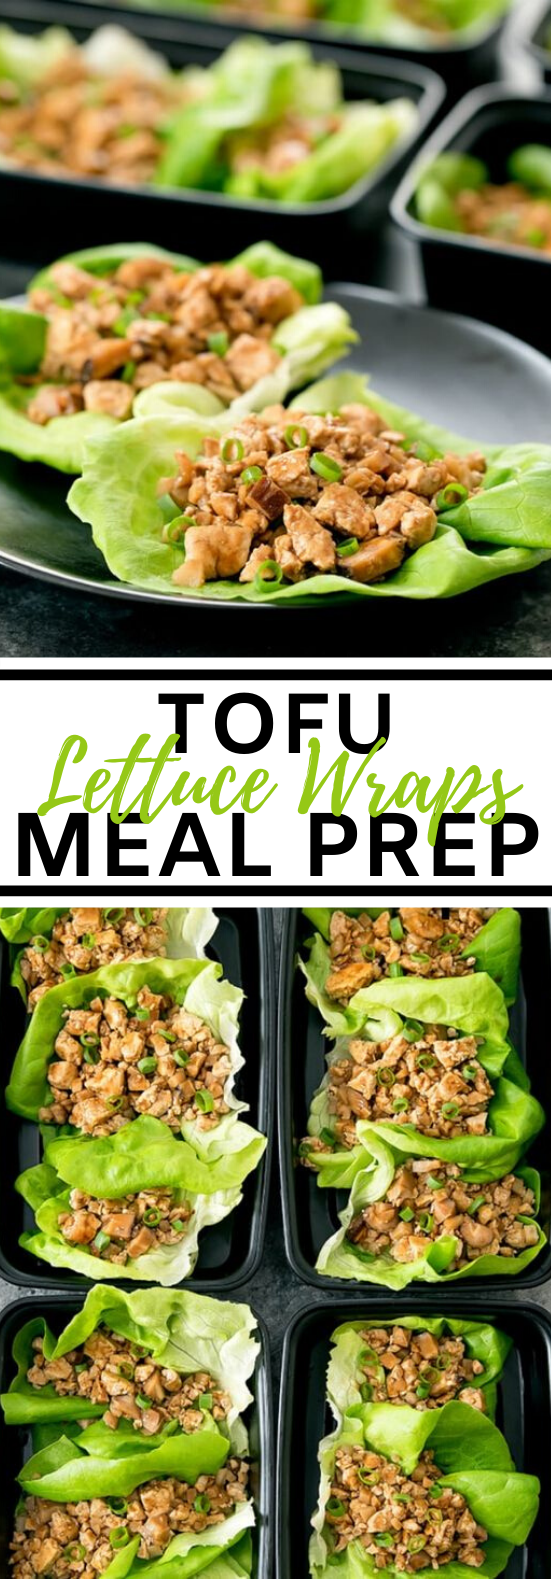 Tofu Lettuce Wraps Meal Prep #vegetarian #recipes #lunch #mealprep #healthy